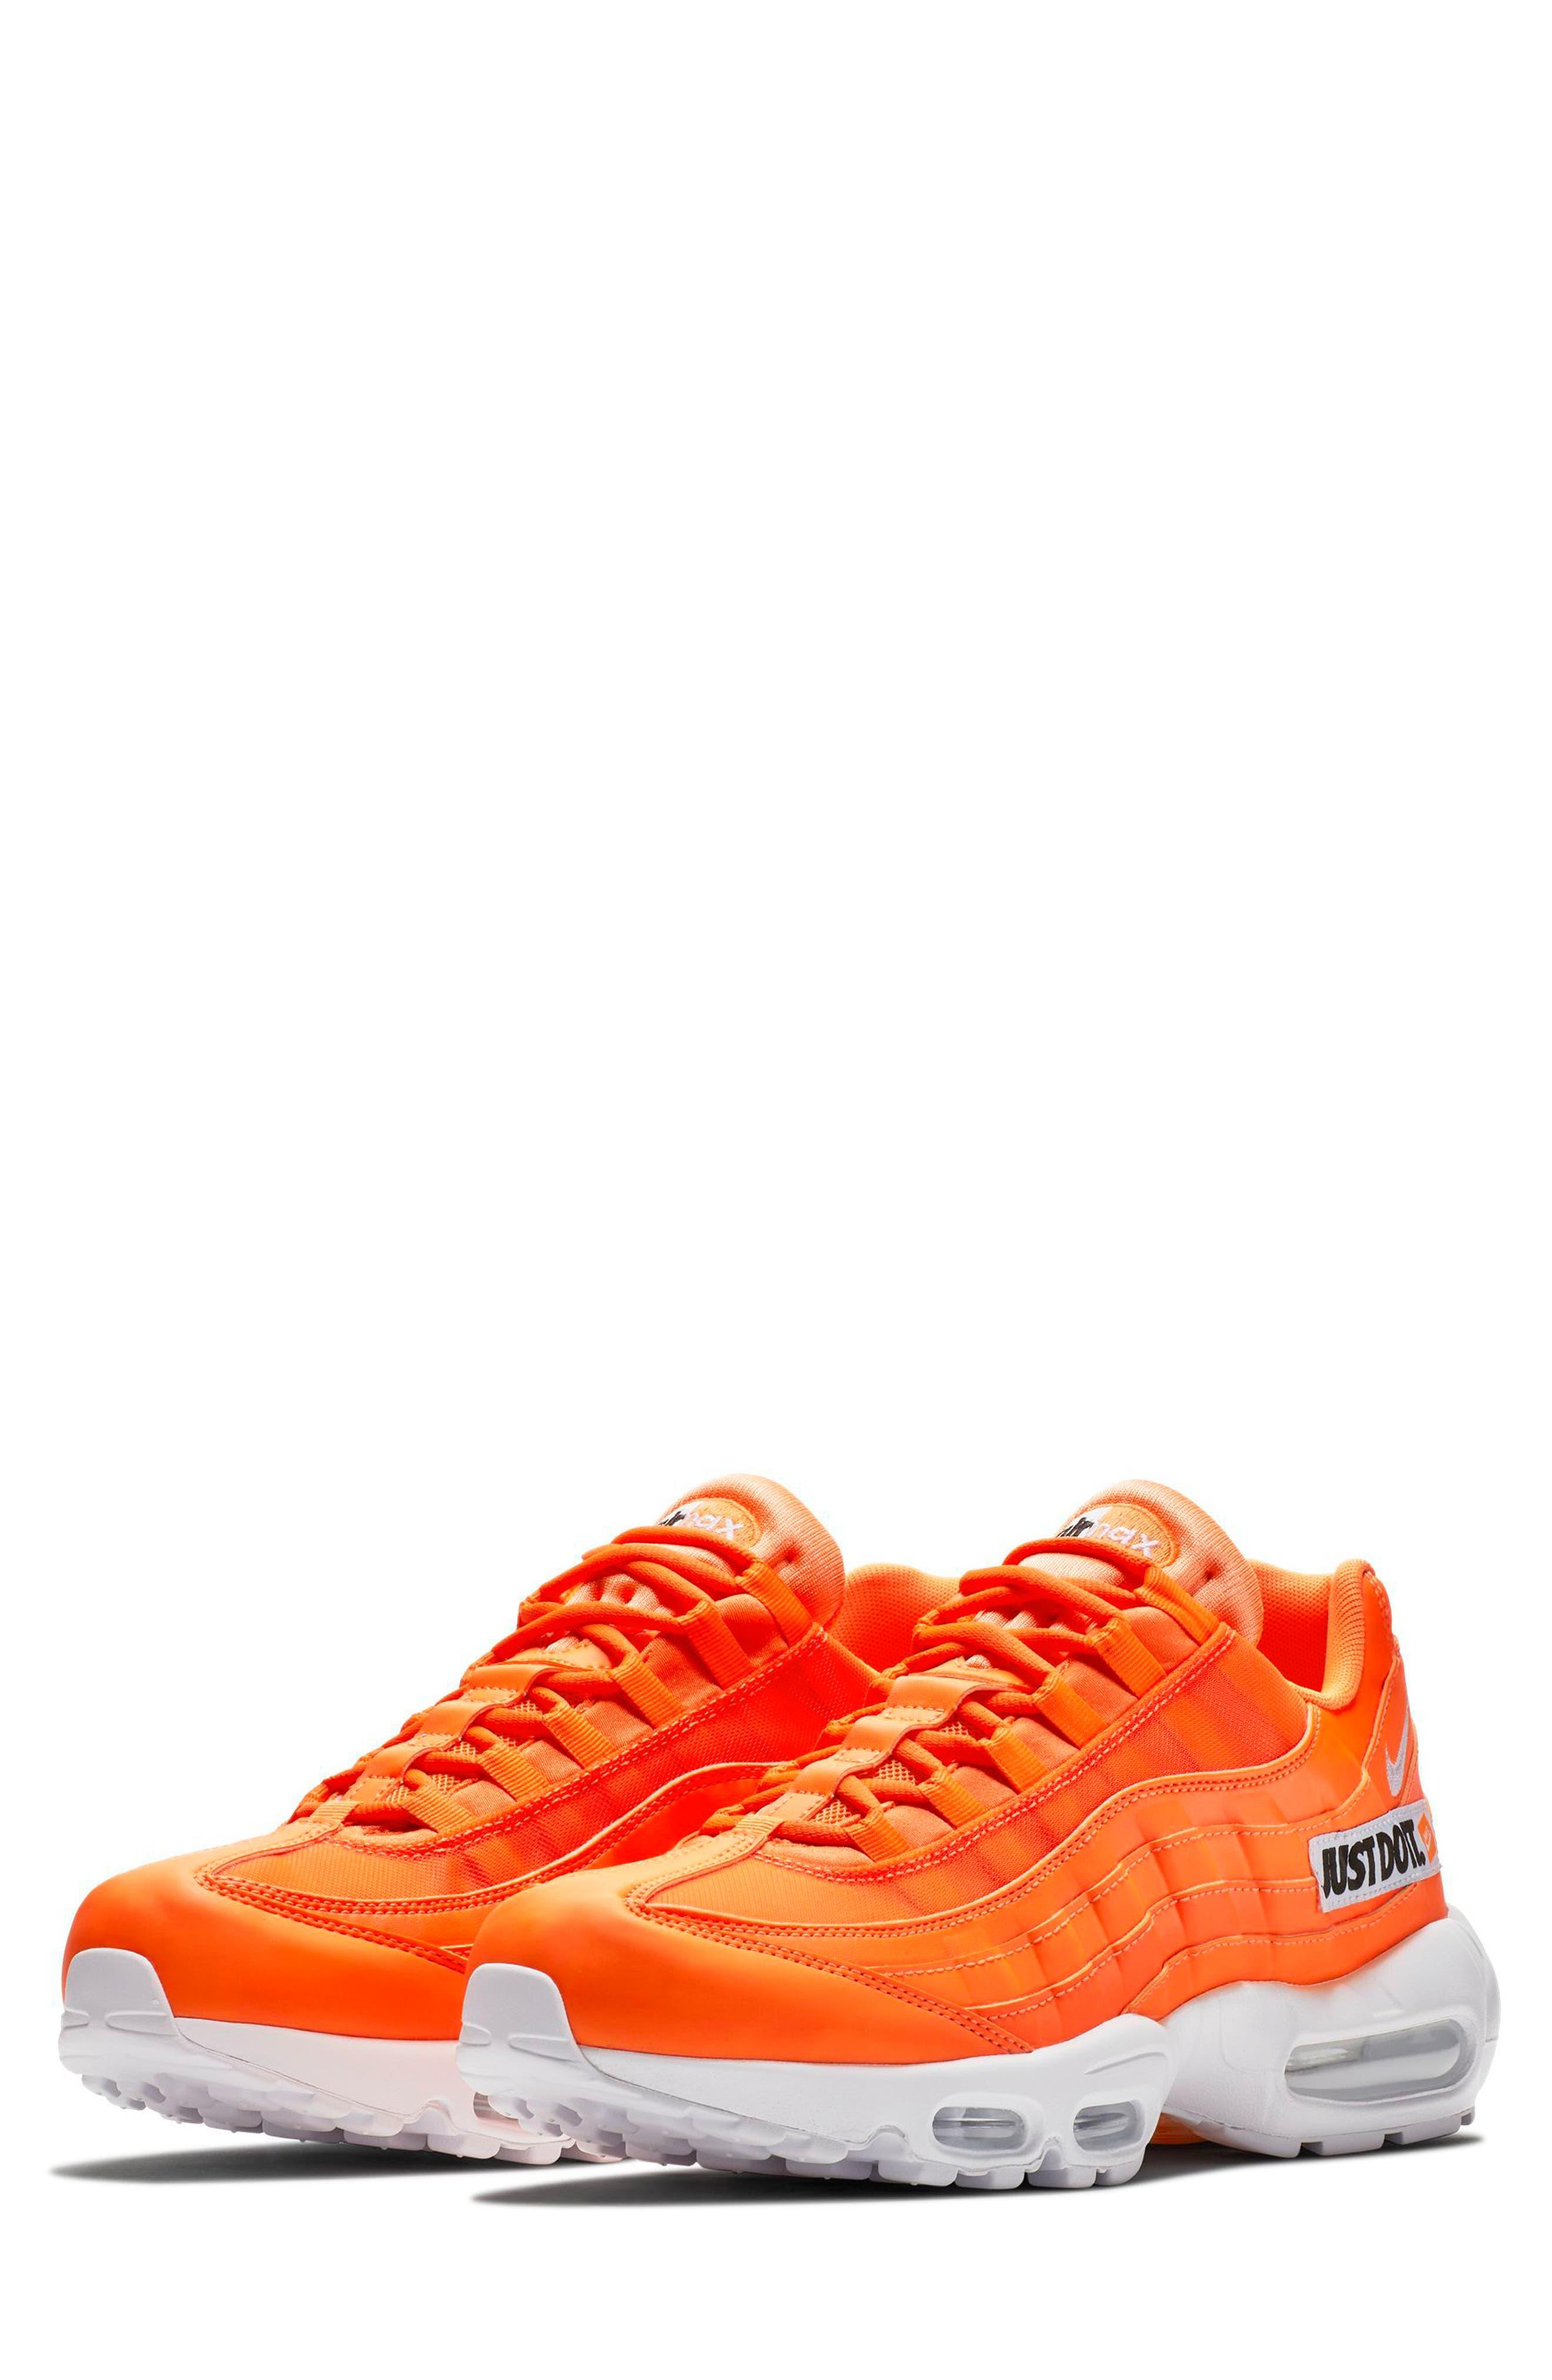 Air Max 95 SE Running Shoe,                             Main thumbnail 1, color,                             ORANGE/ WHT-BLK